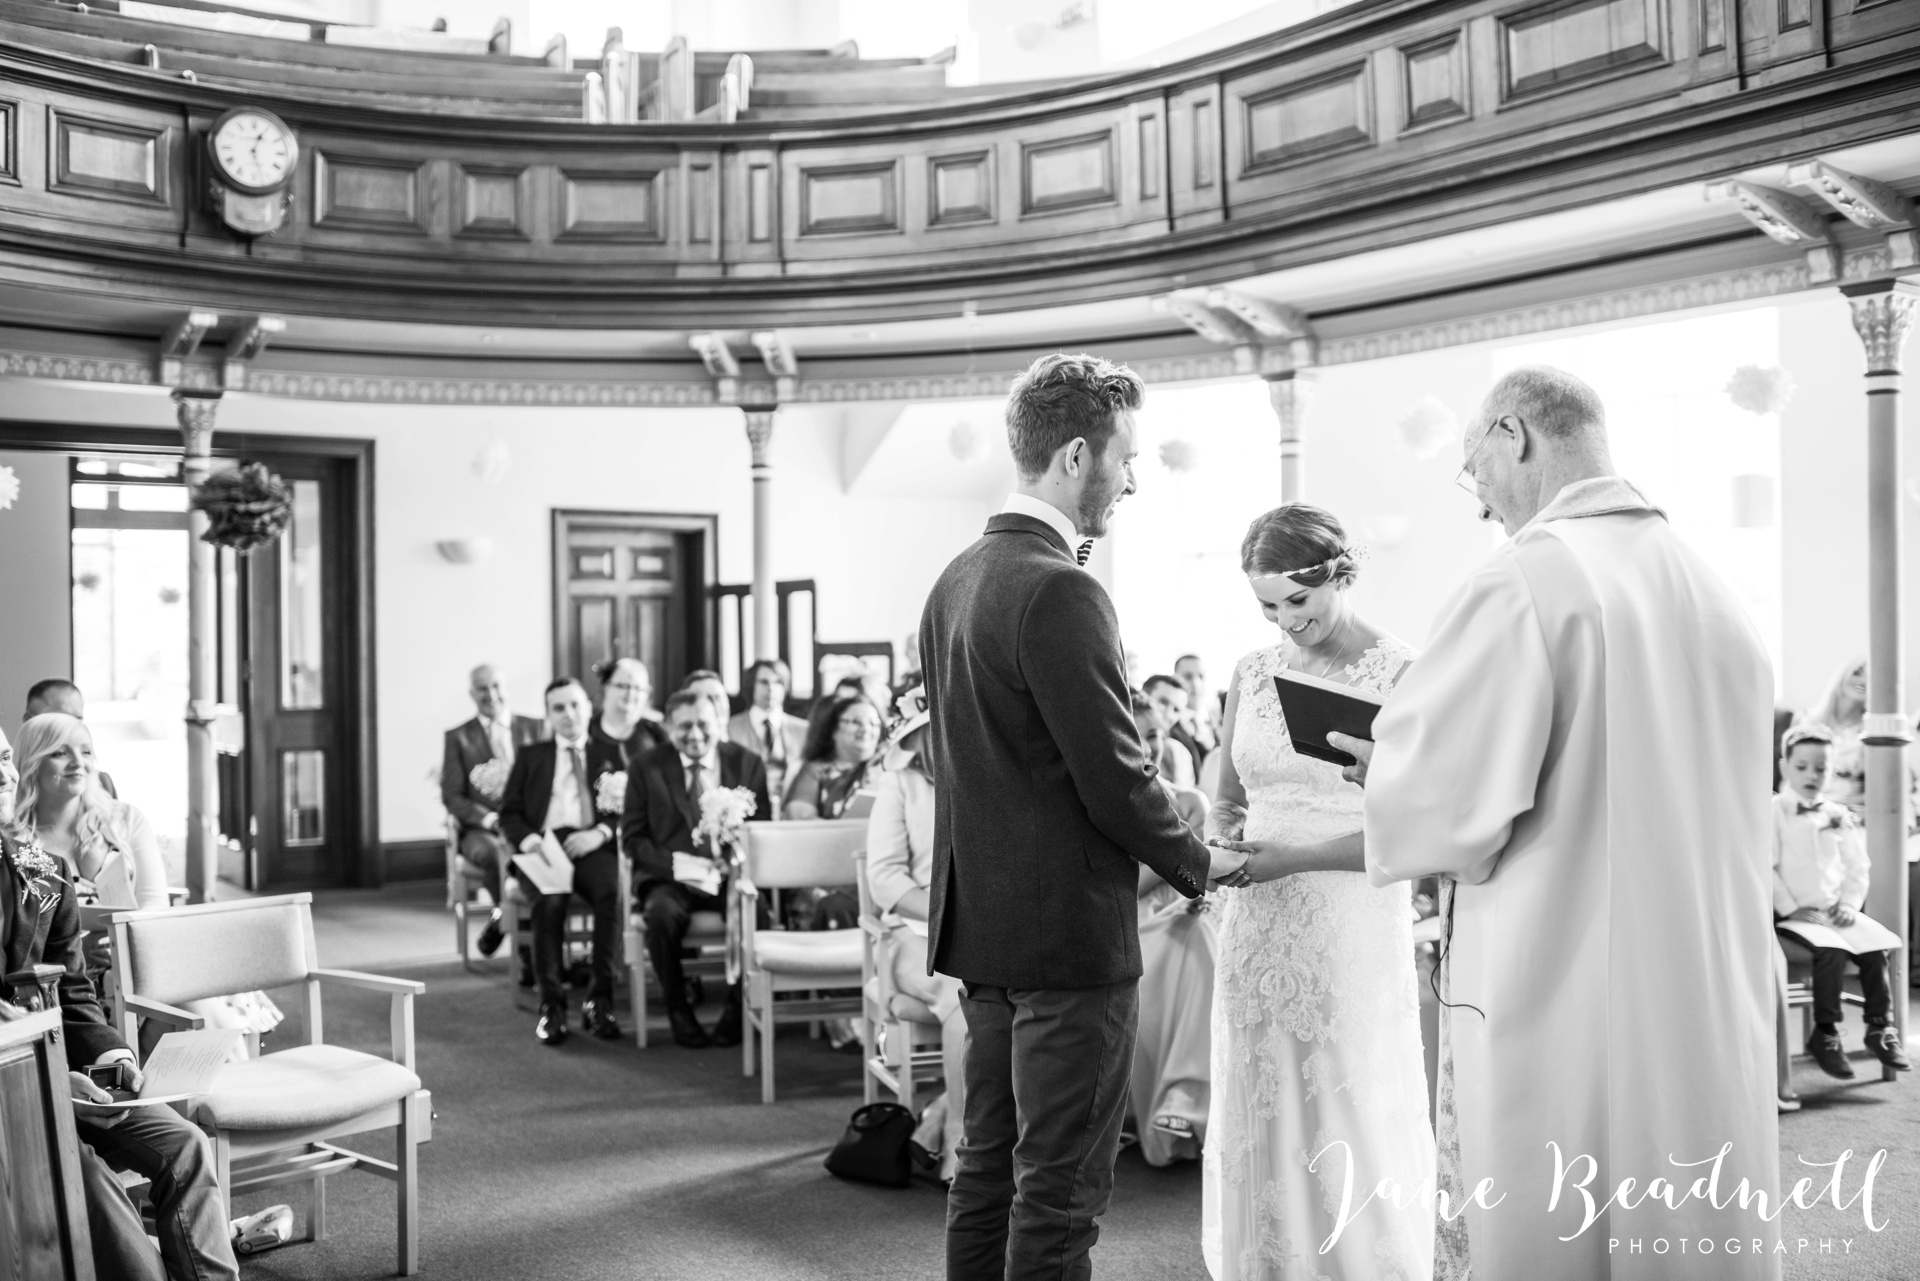 Jane Beadnell fine art wedding photographer The Old Deanery Ripon_0035